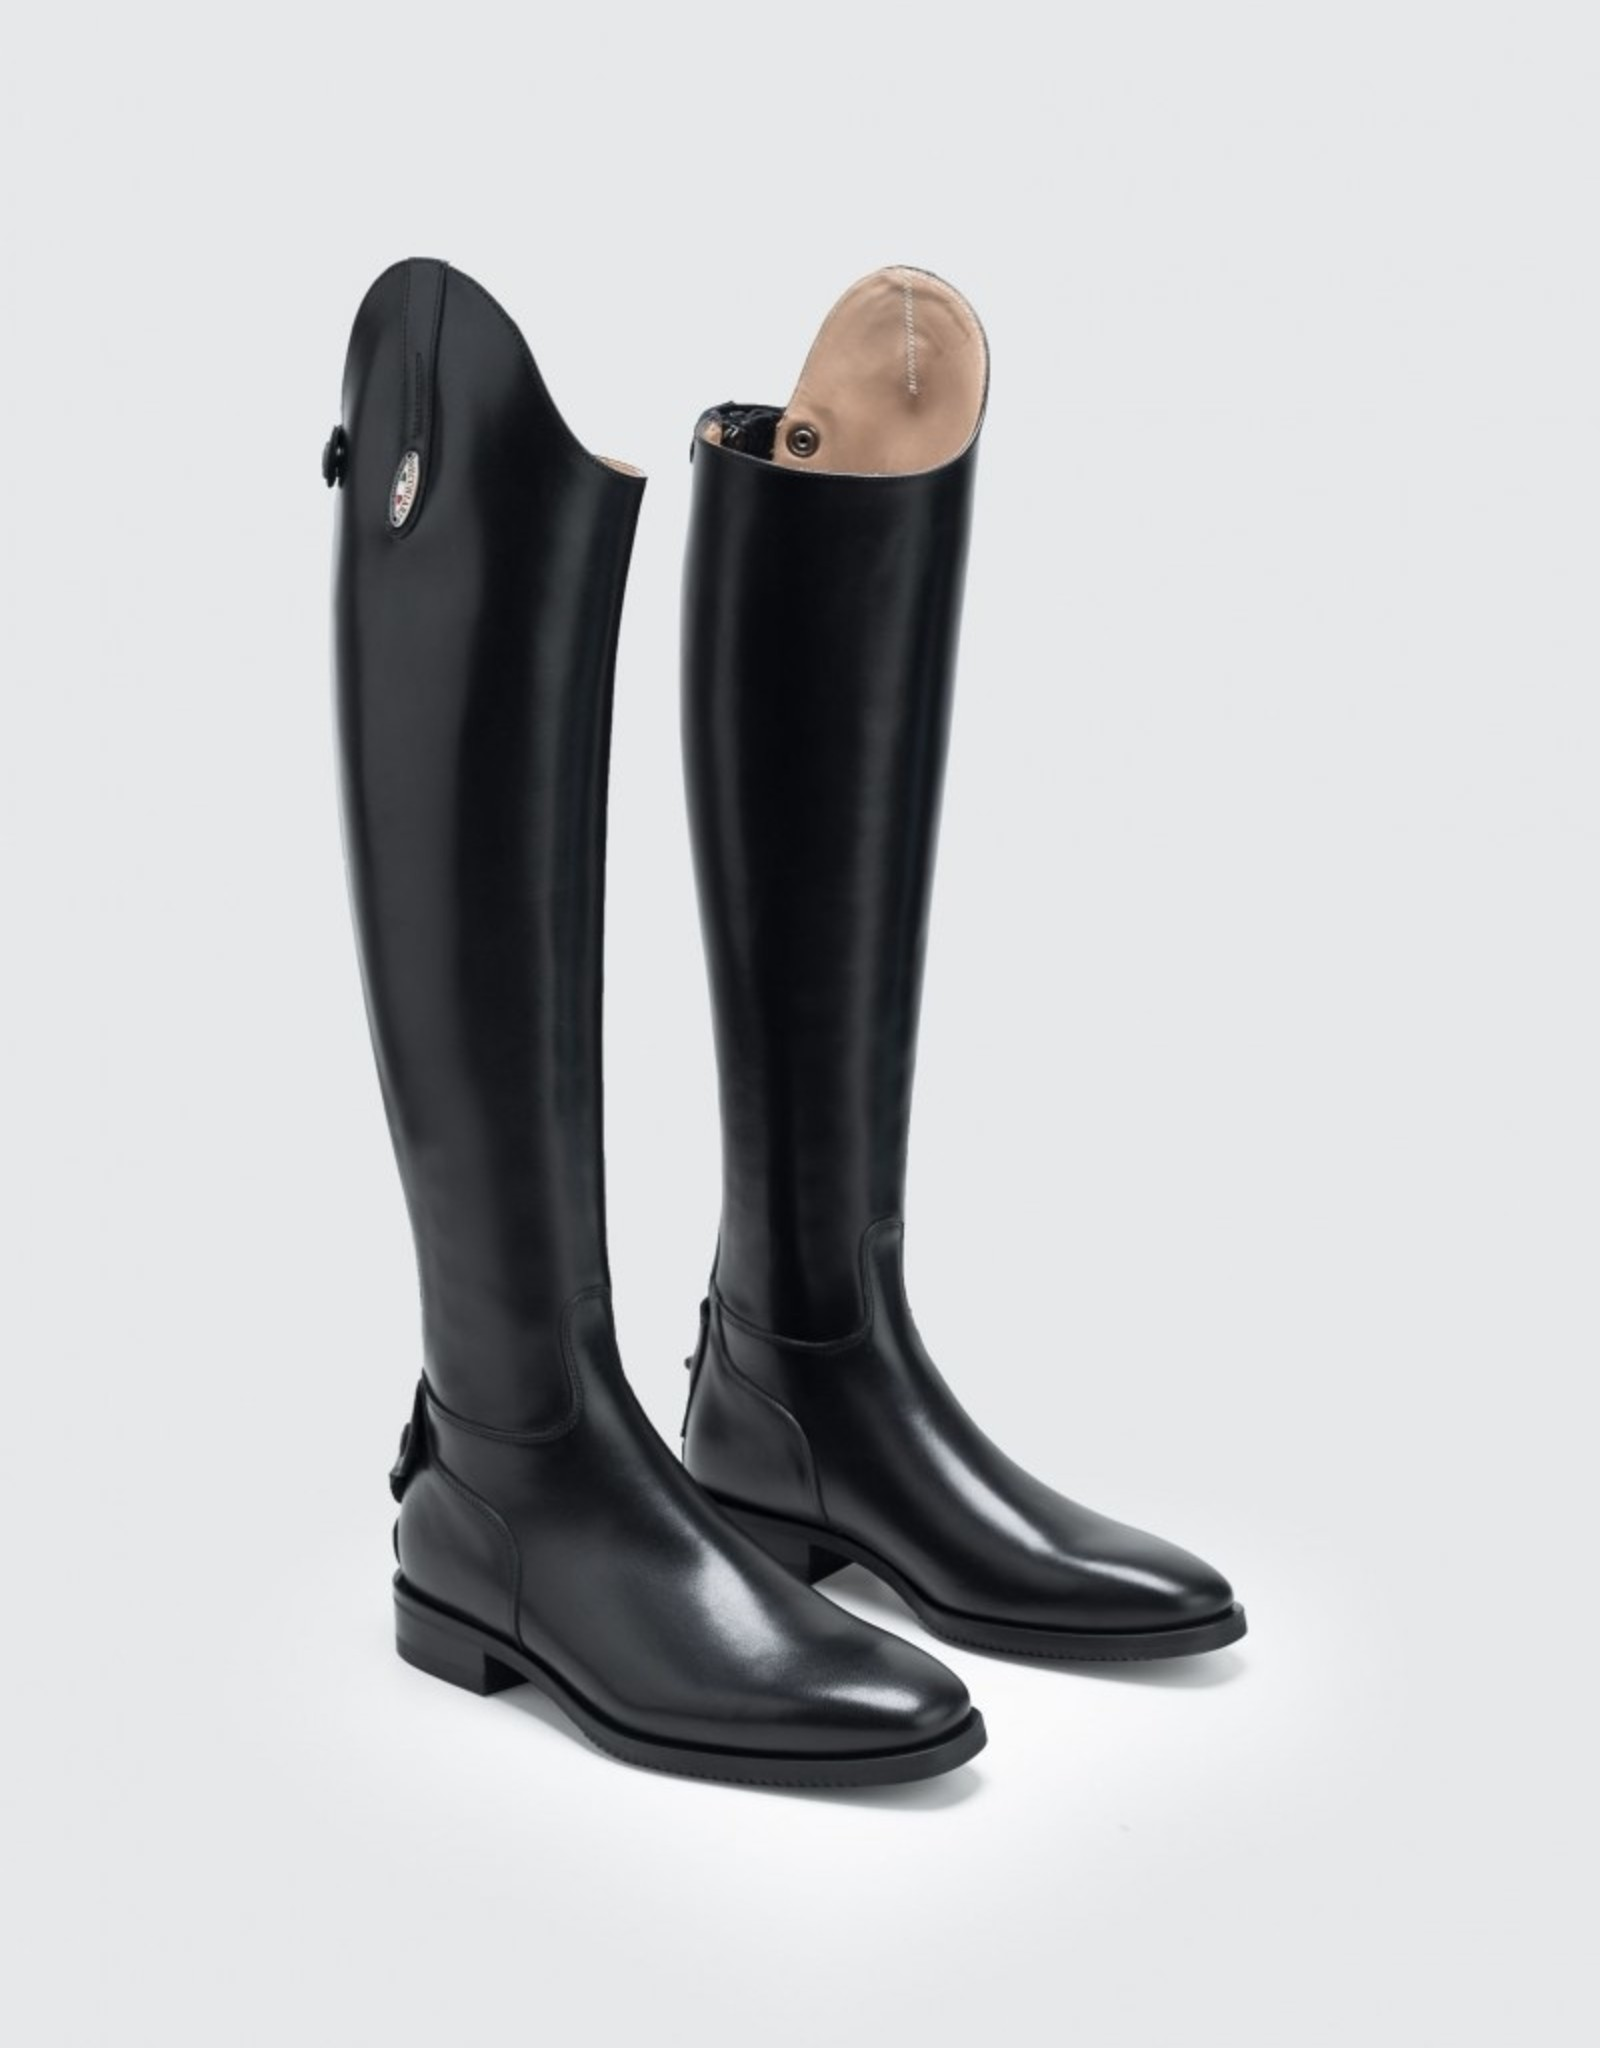 Secchiari Secchiari Ladies' Dress Boot